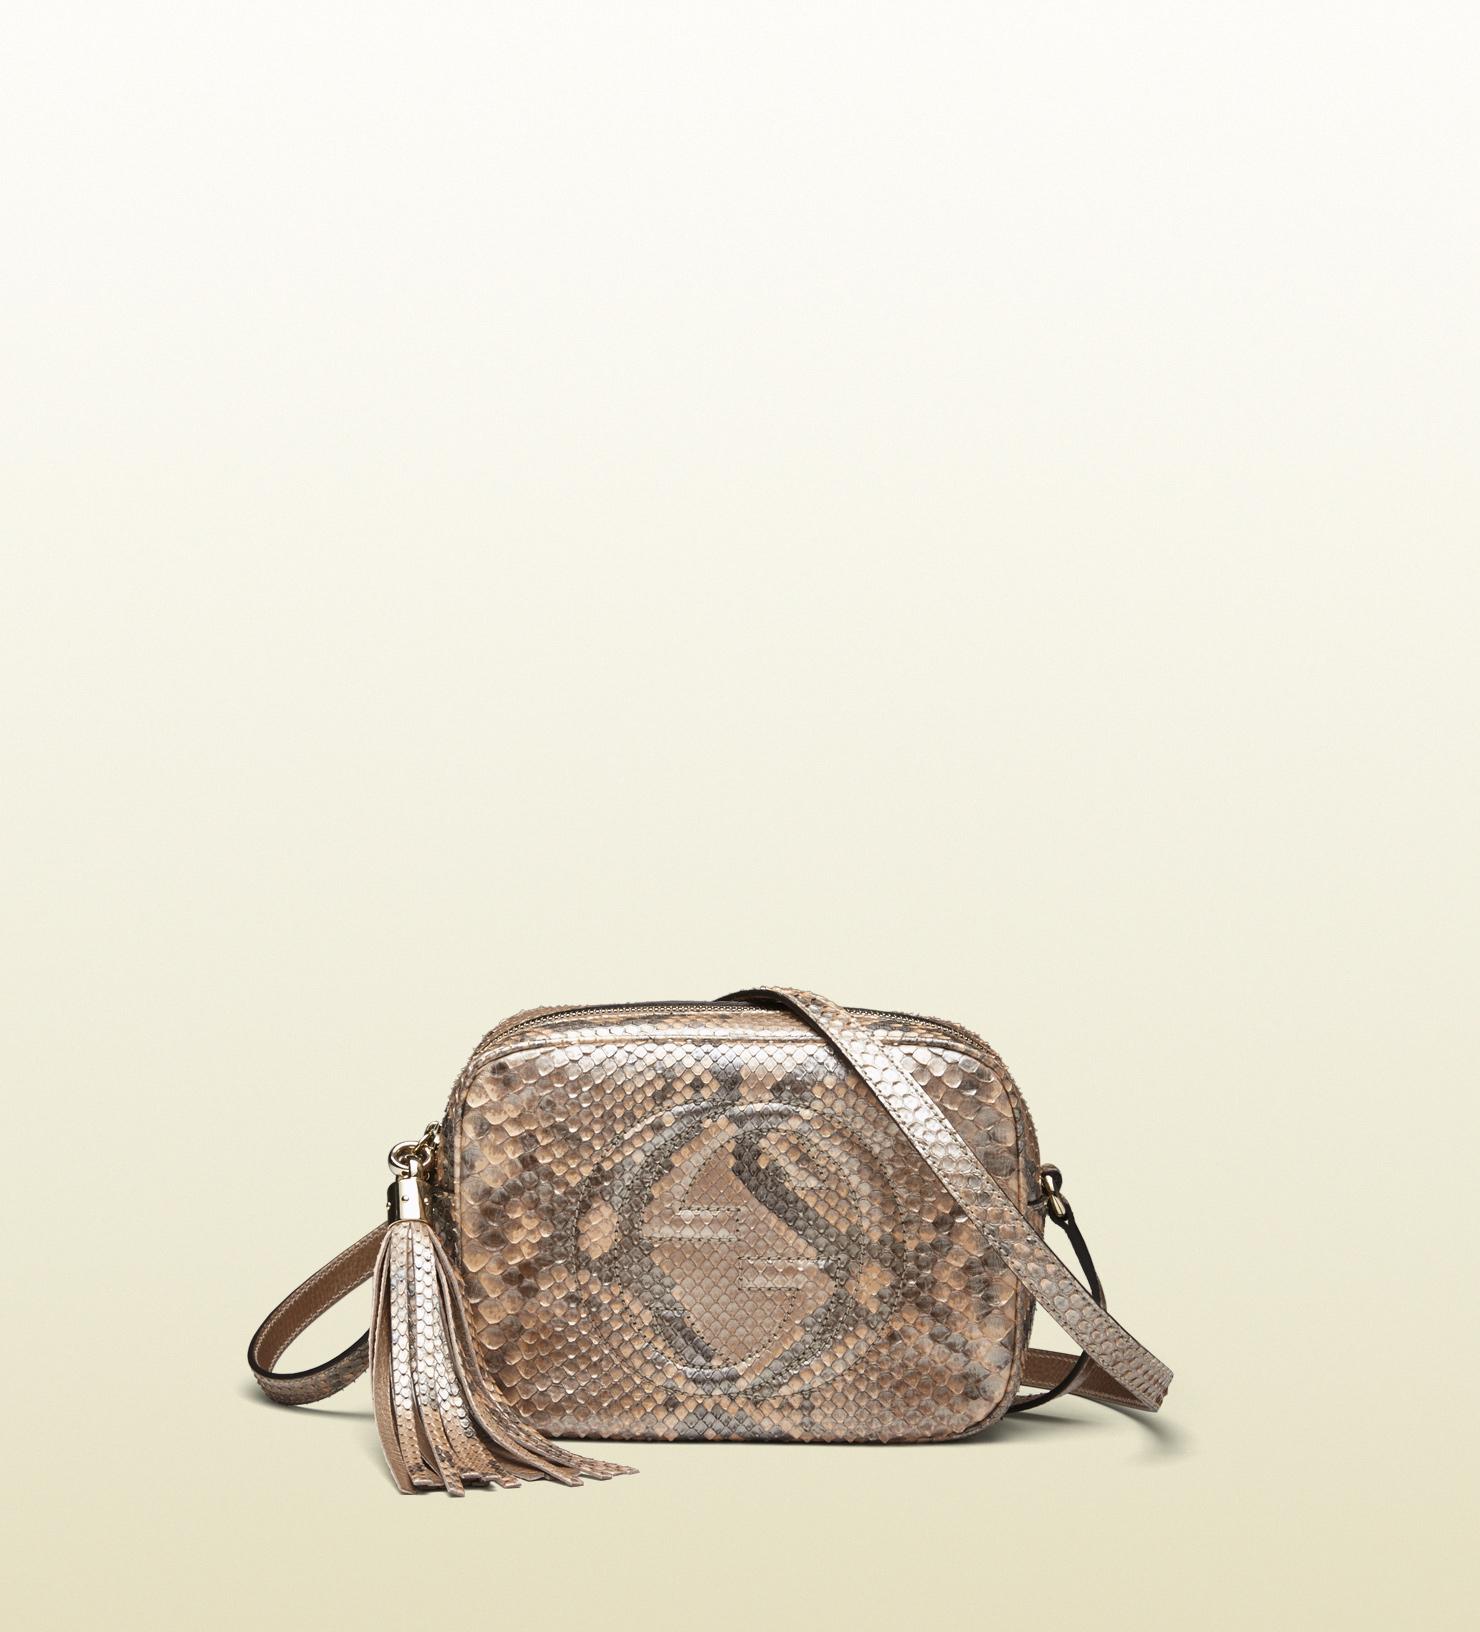 2d9f4e110283 Gucci Metallic Leather Small Soho Disco Bag Golden Beige 80187 ...